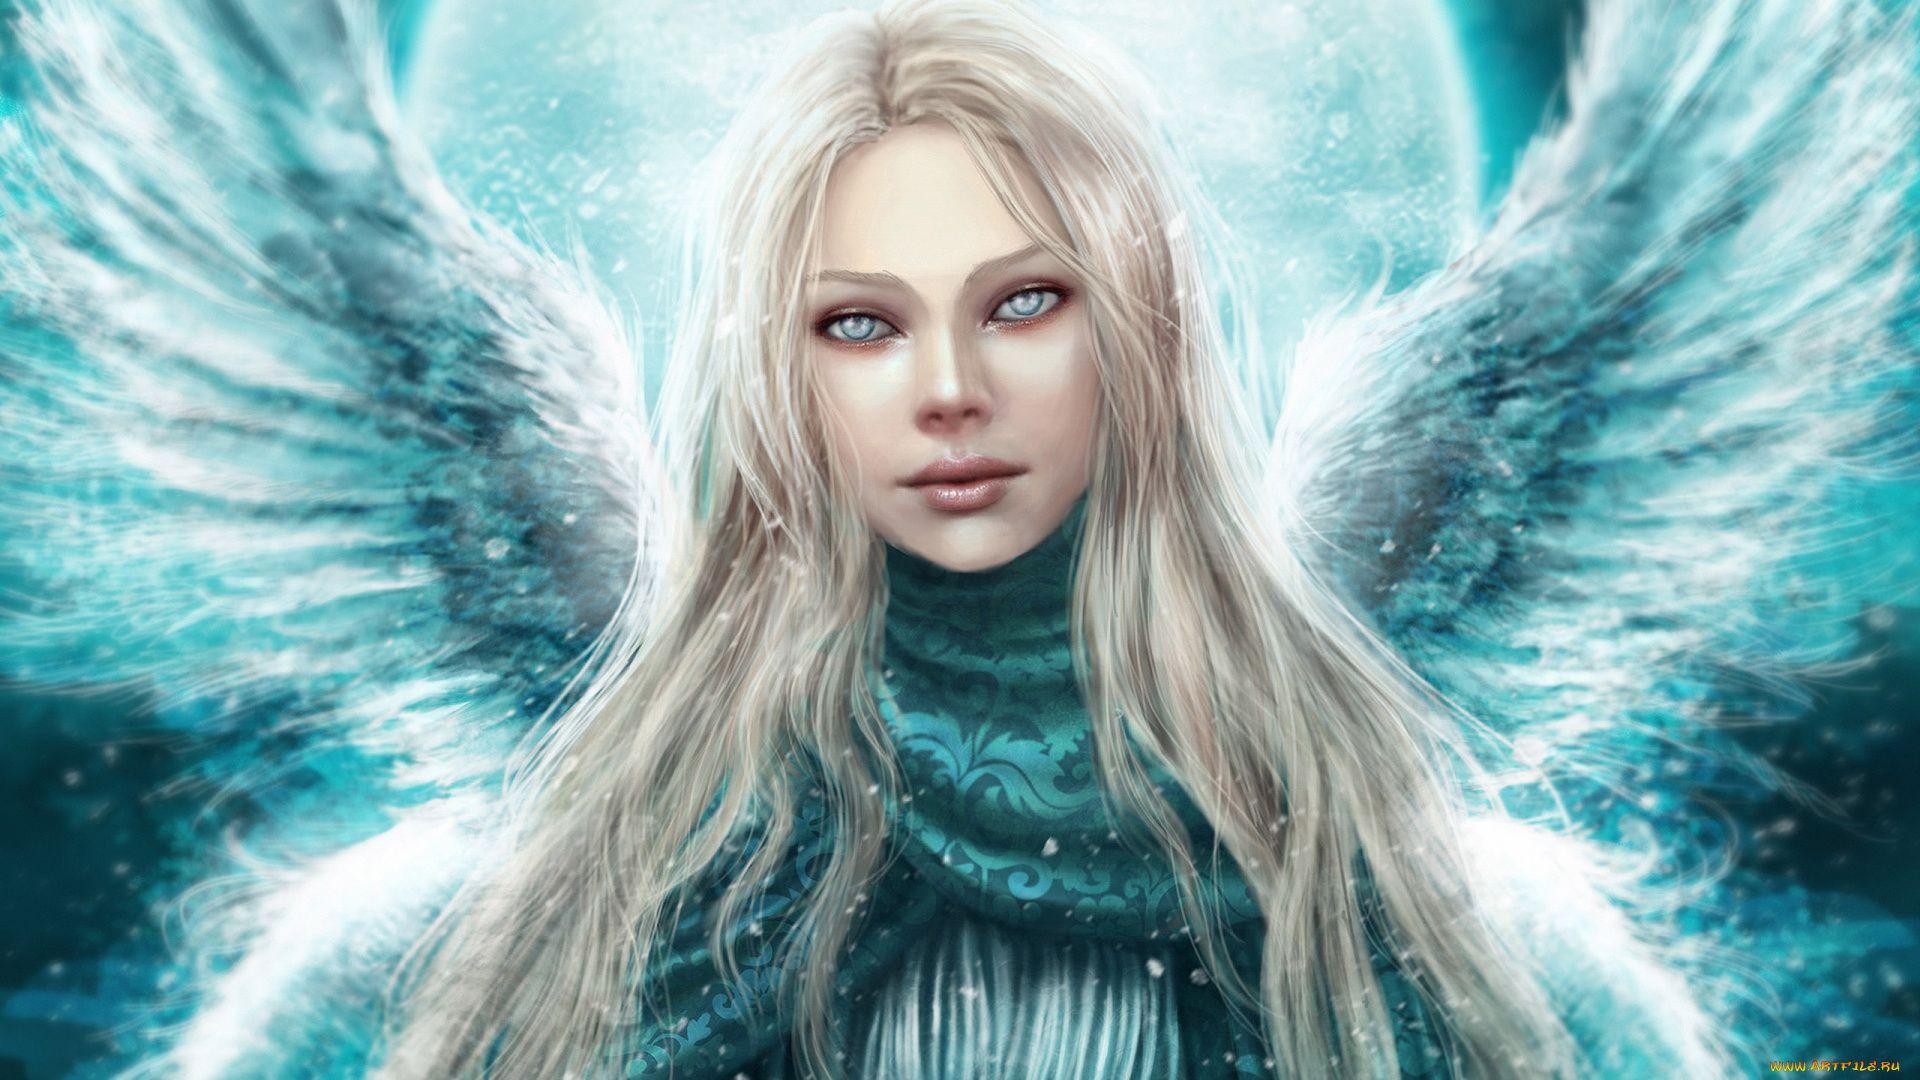 Photo Fantasy Girls Angels